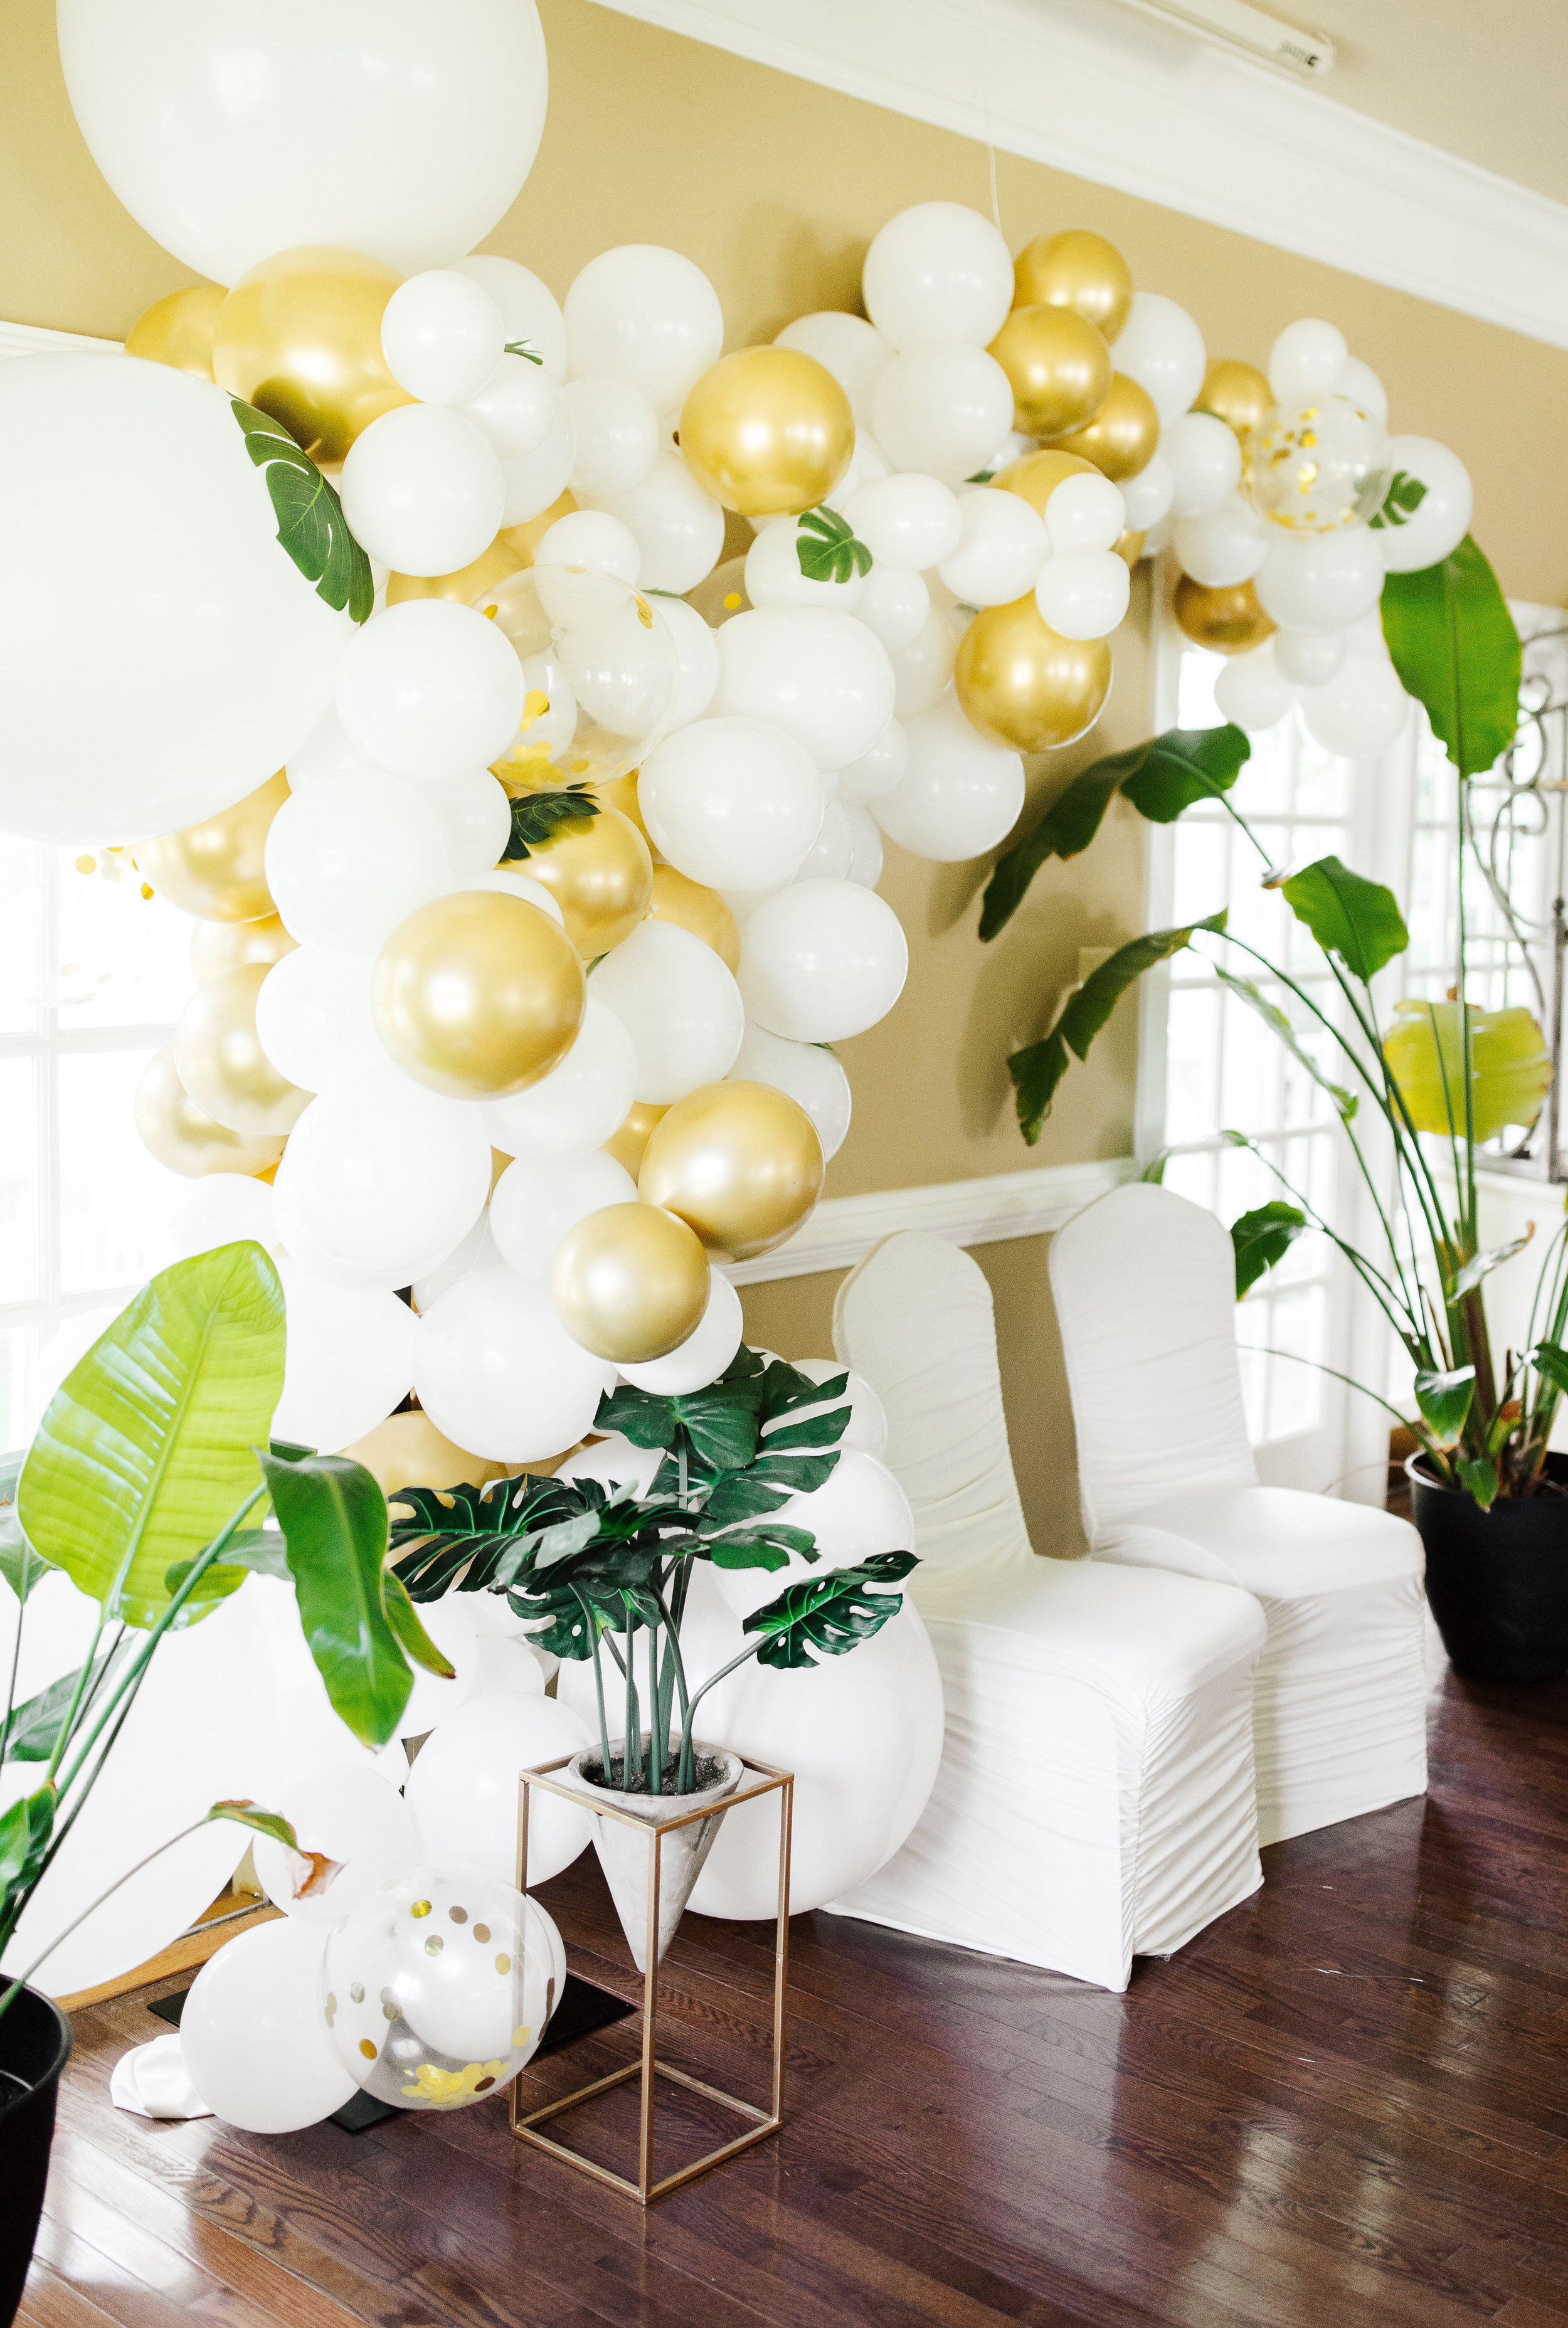 memphis-tennessee-wedding-planner-floral-designer-balloon-design-balloon-installation-bonne-terre-whit-photography